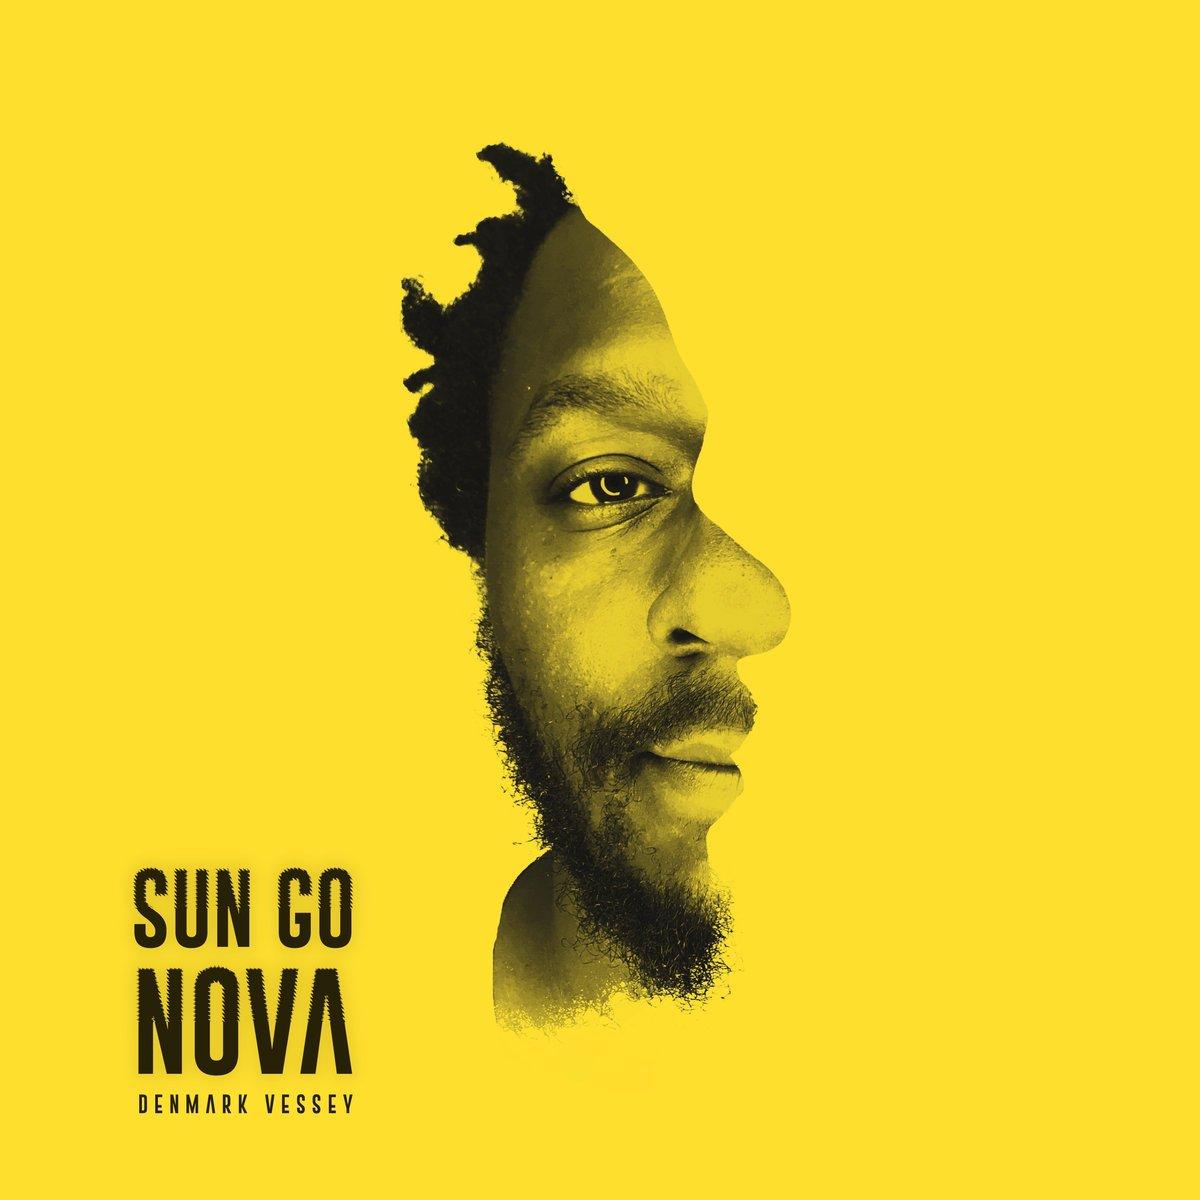 Vinilo : Denmark Vessey - Sun Go Nova (LP Vinyl)